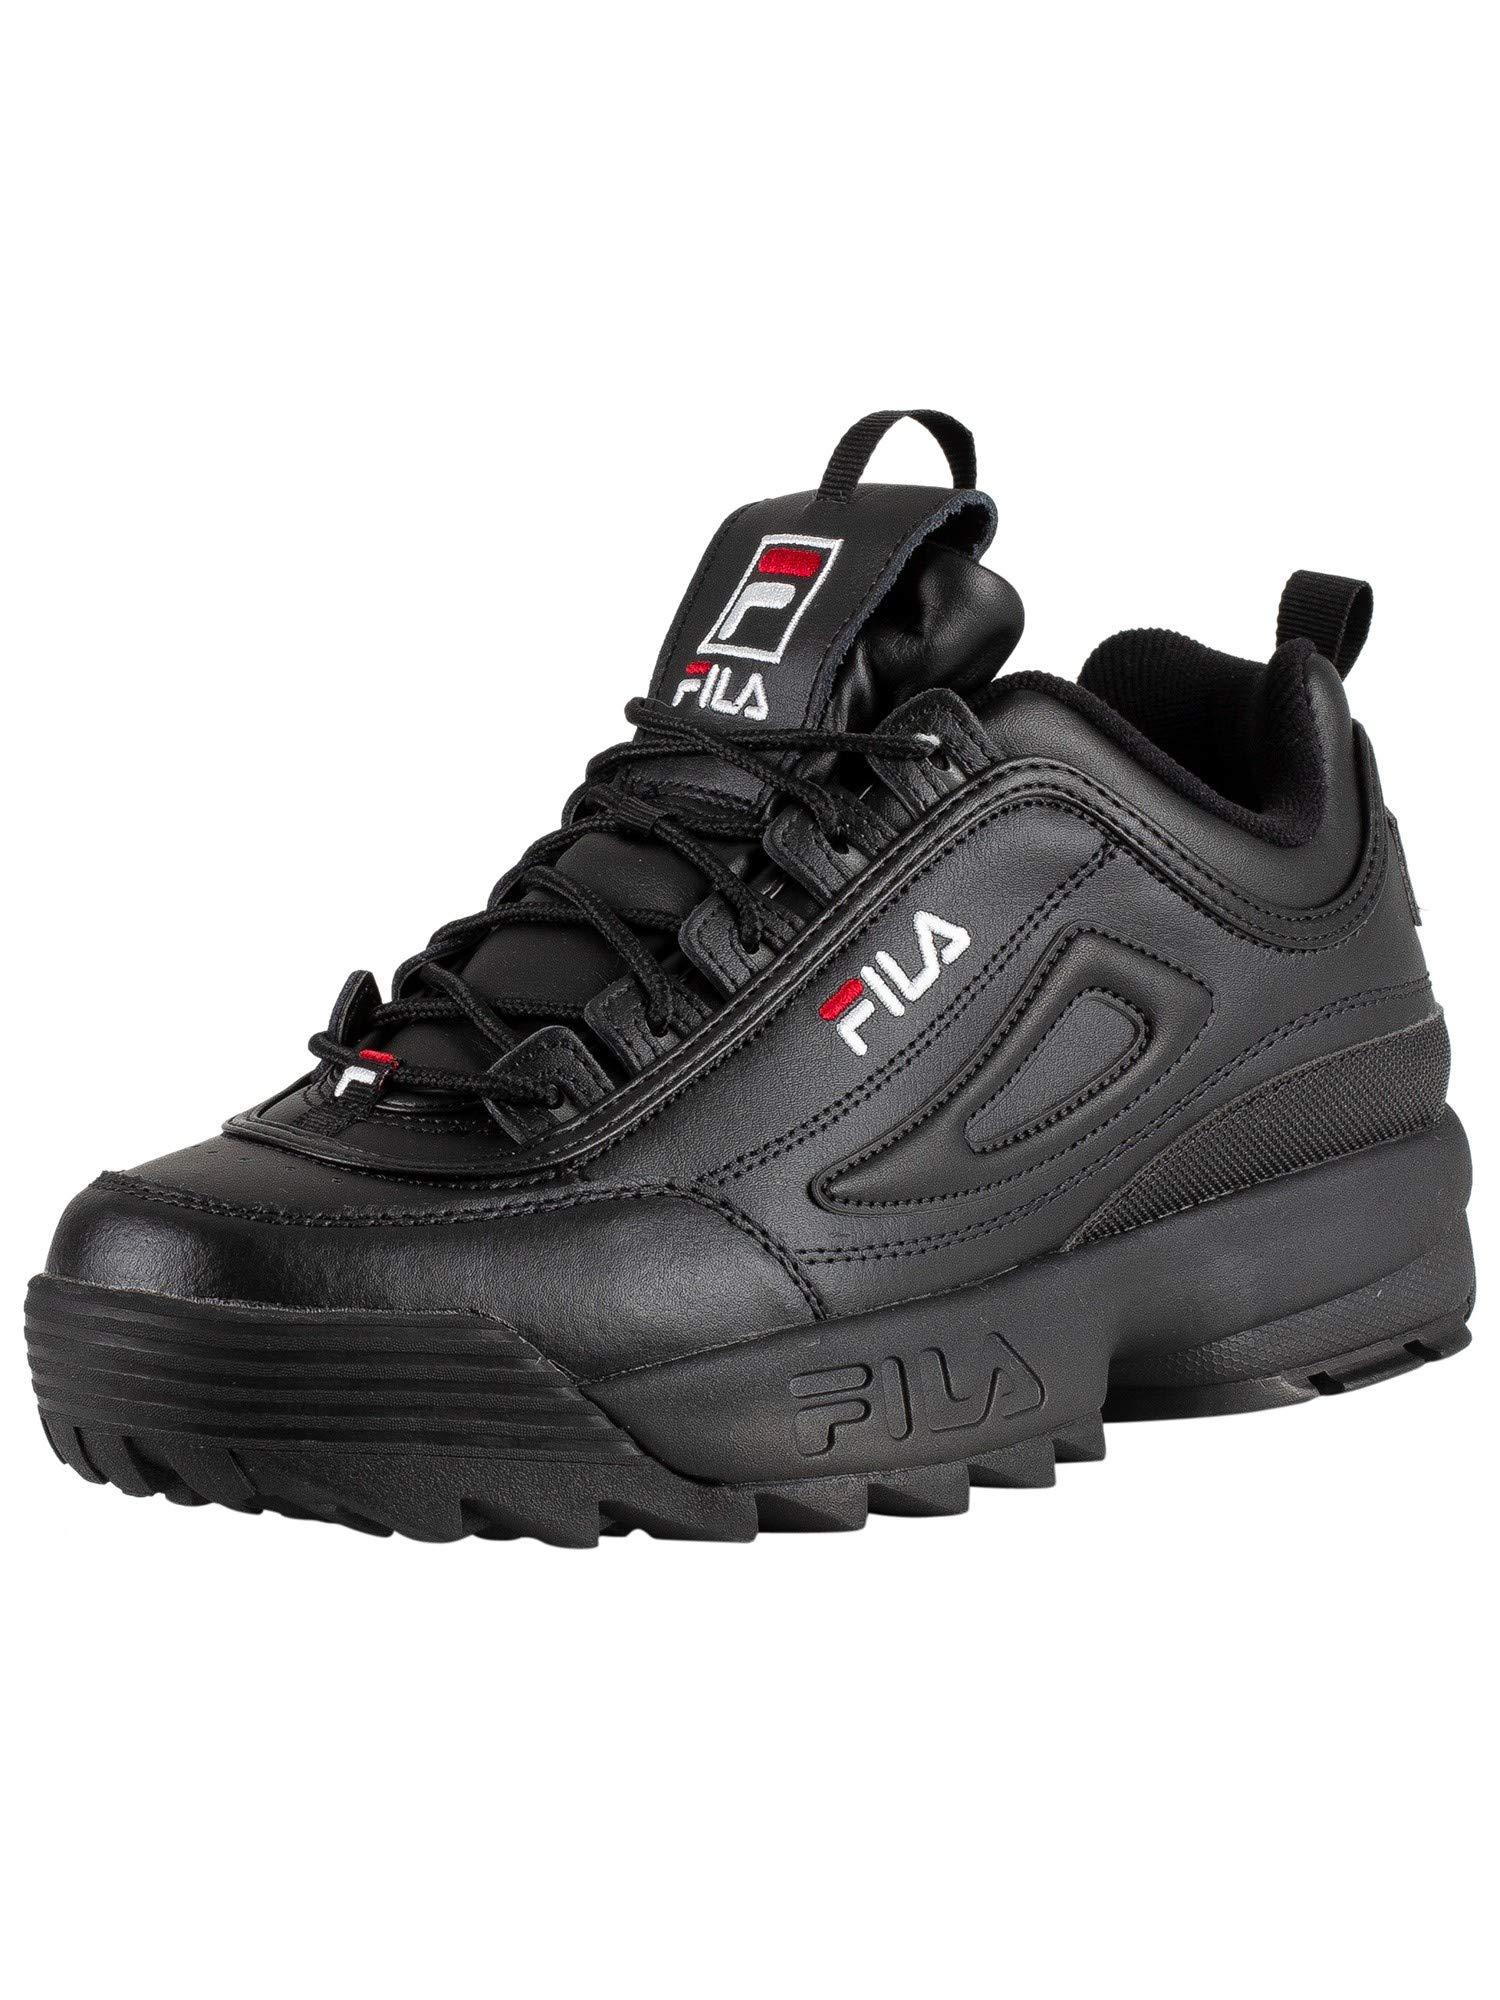 Fila Disruptor Ii Premium Herren Sneaker